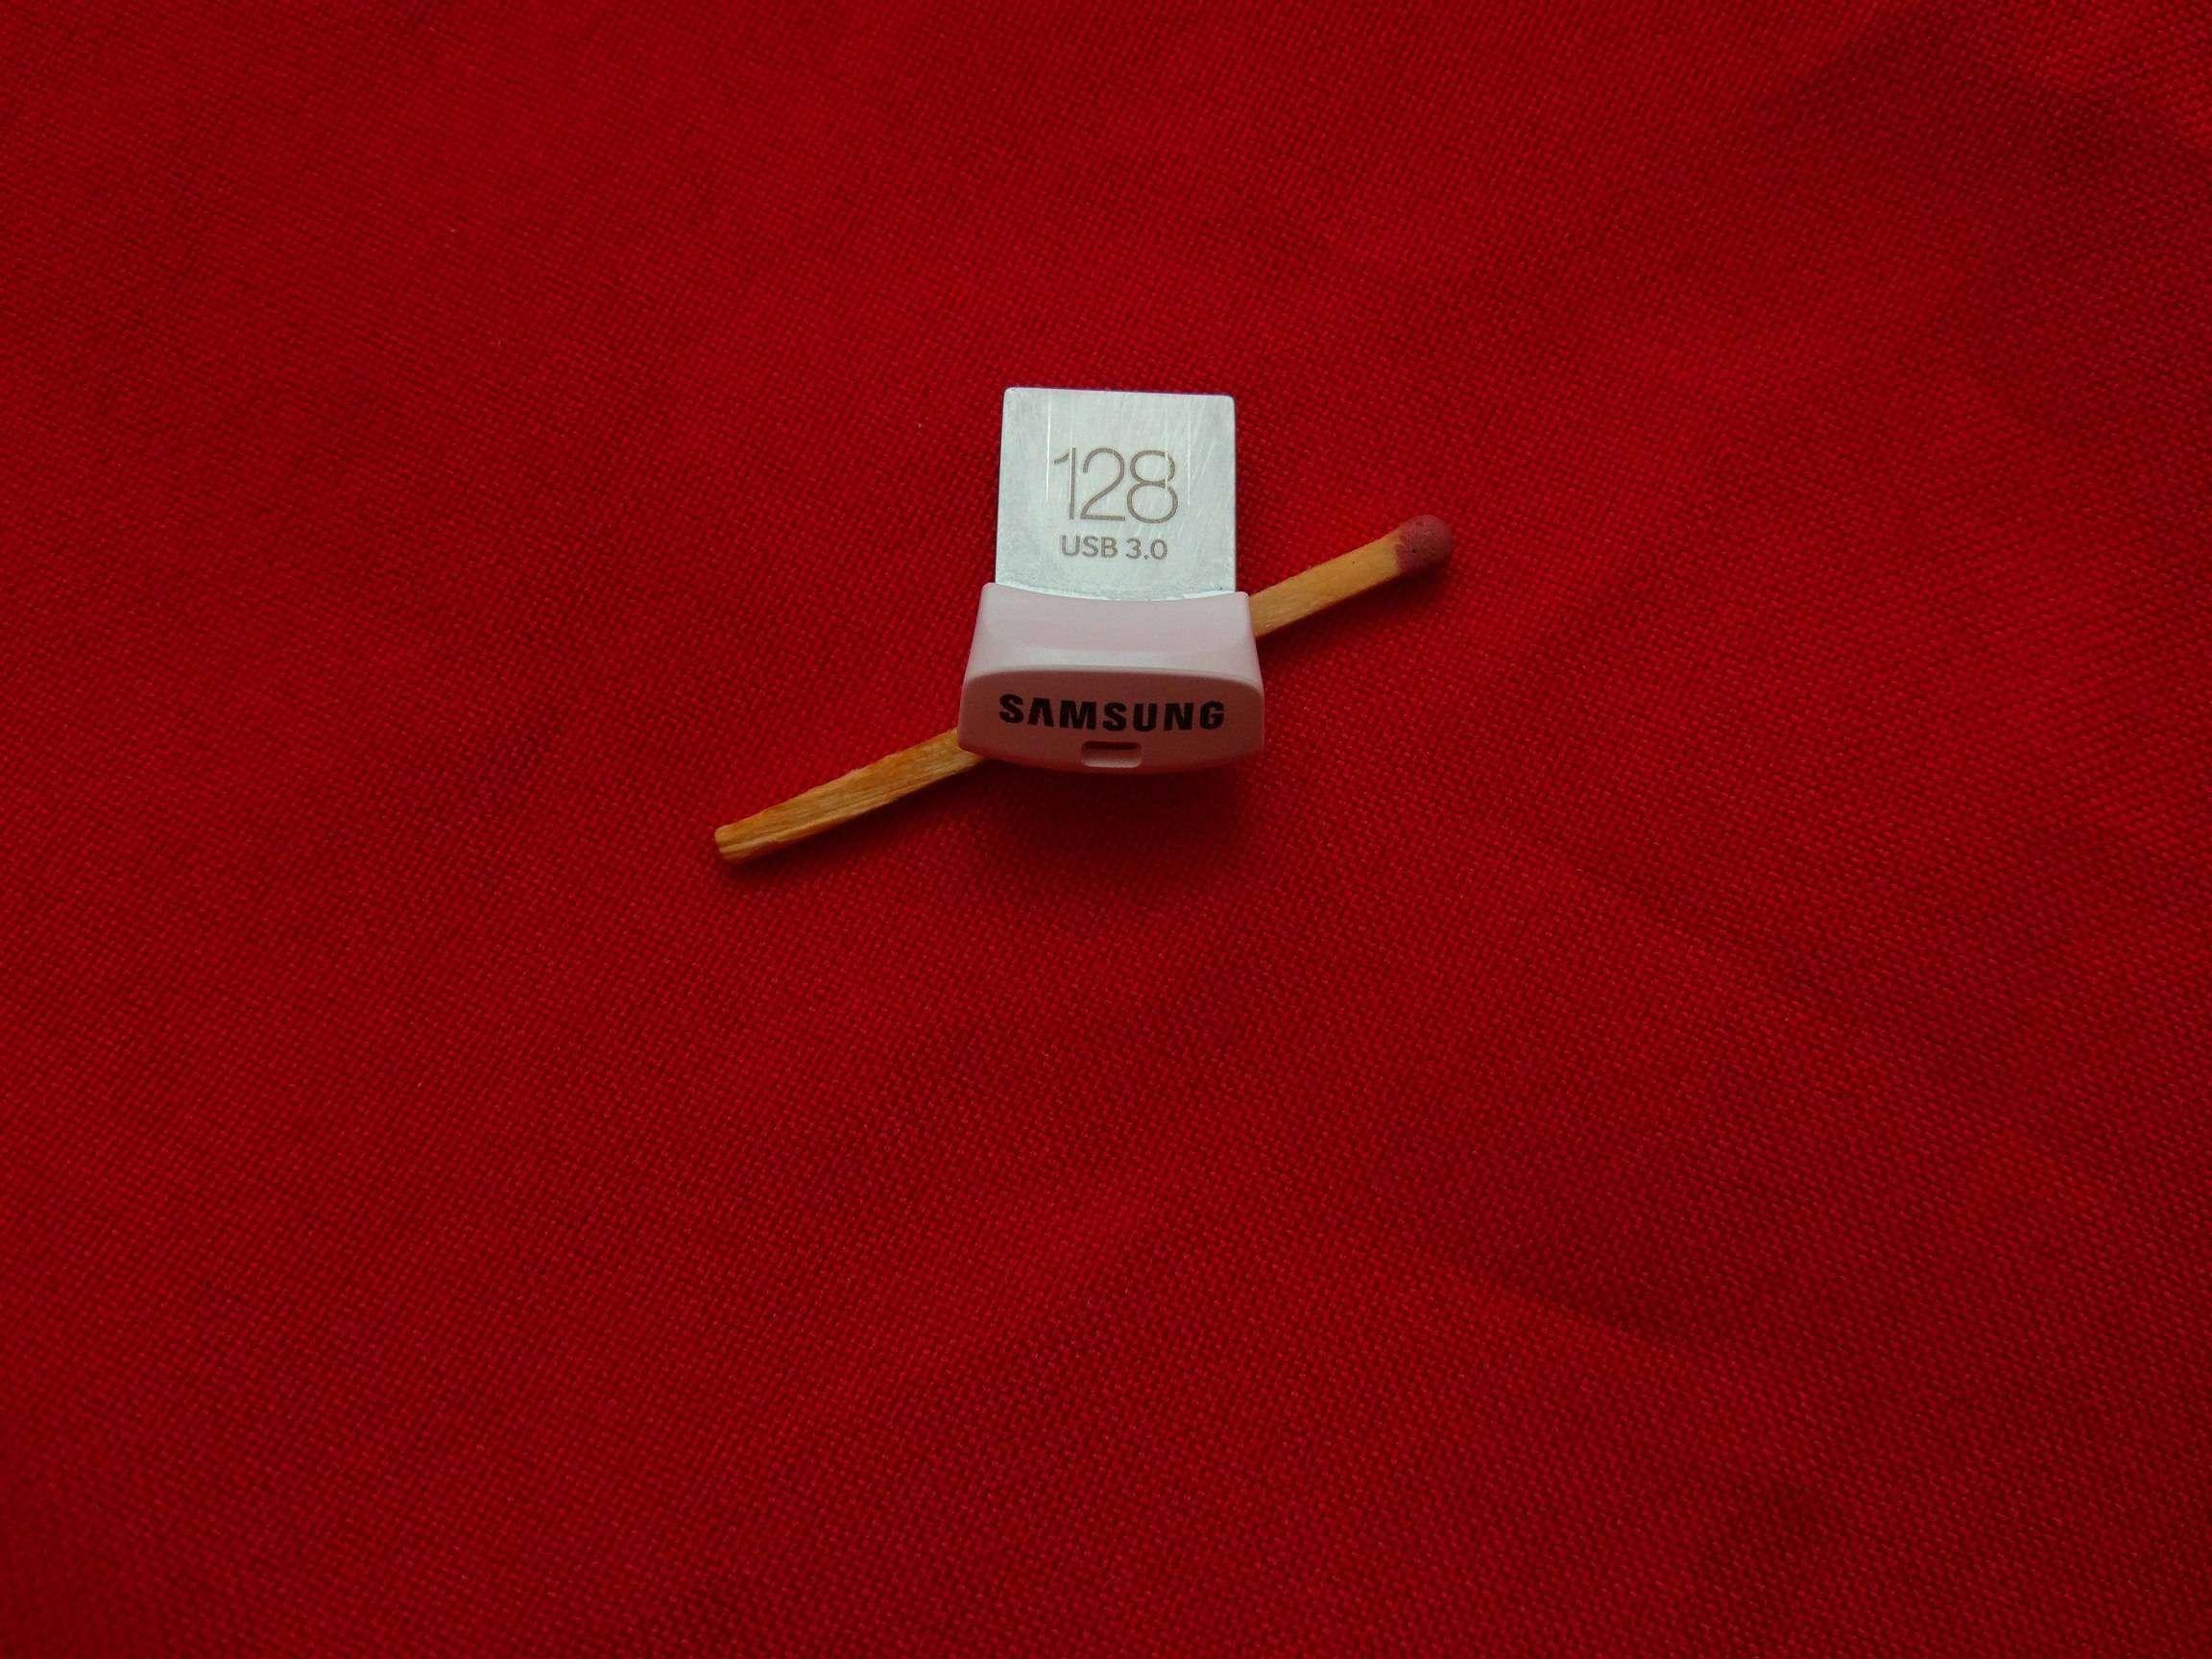 Другие - Китай: Samsung FIT 128G USB 3.0 - миниобзор нано USB флешки